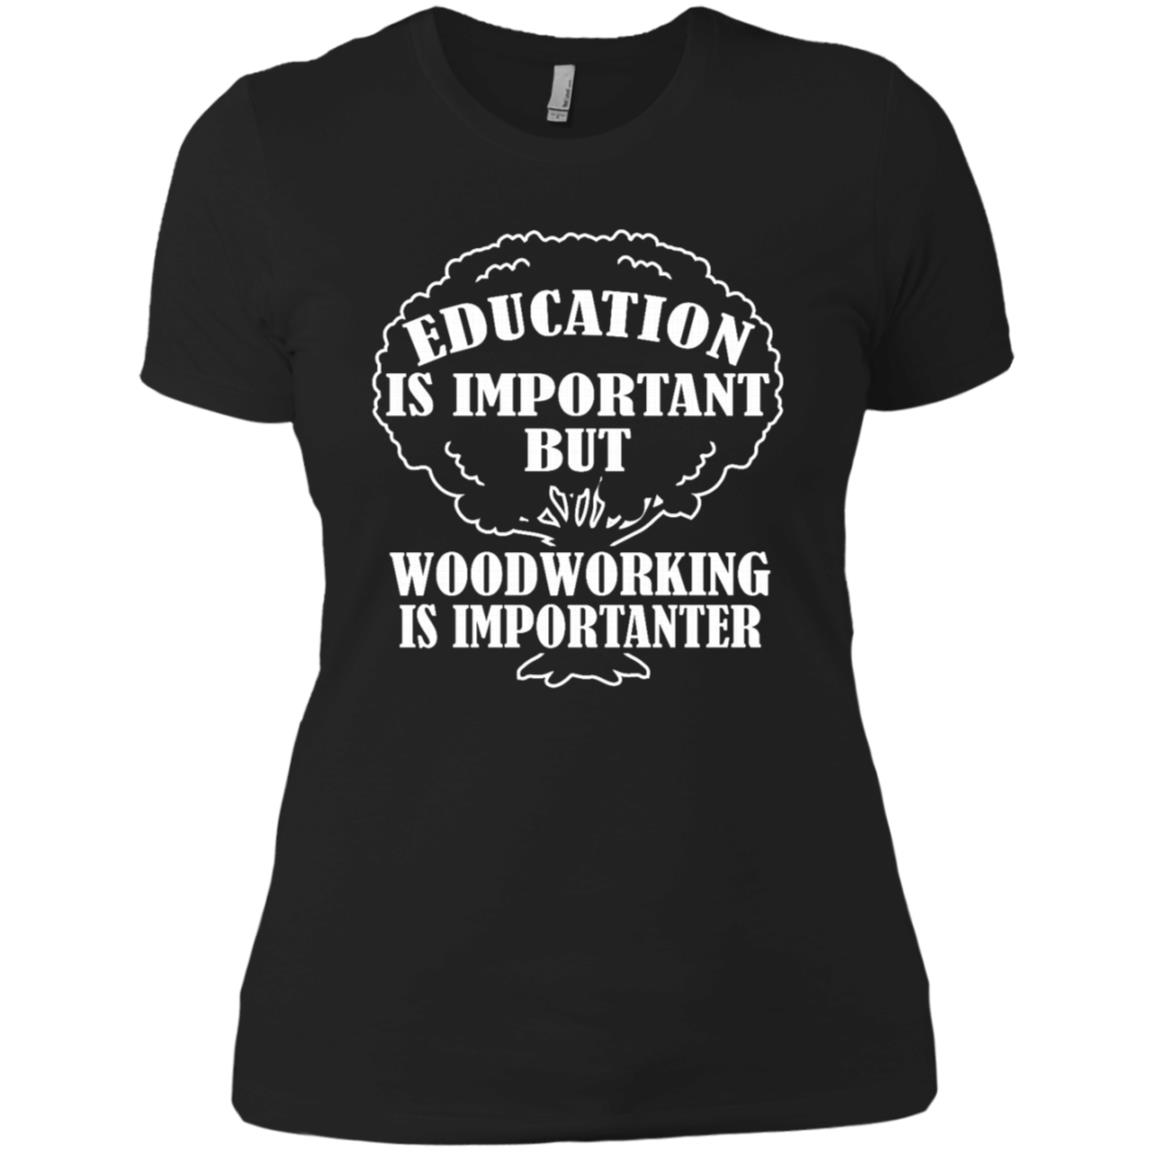 Woodworking Is Importanter Woodworking Mens Gift -1 Women Short Sleeve